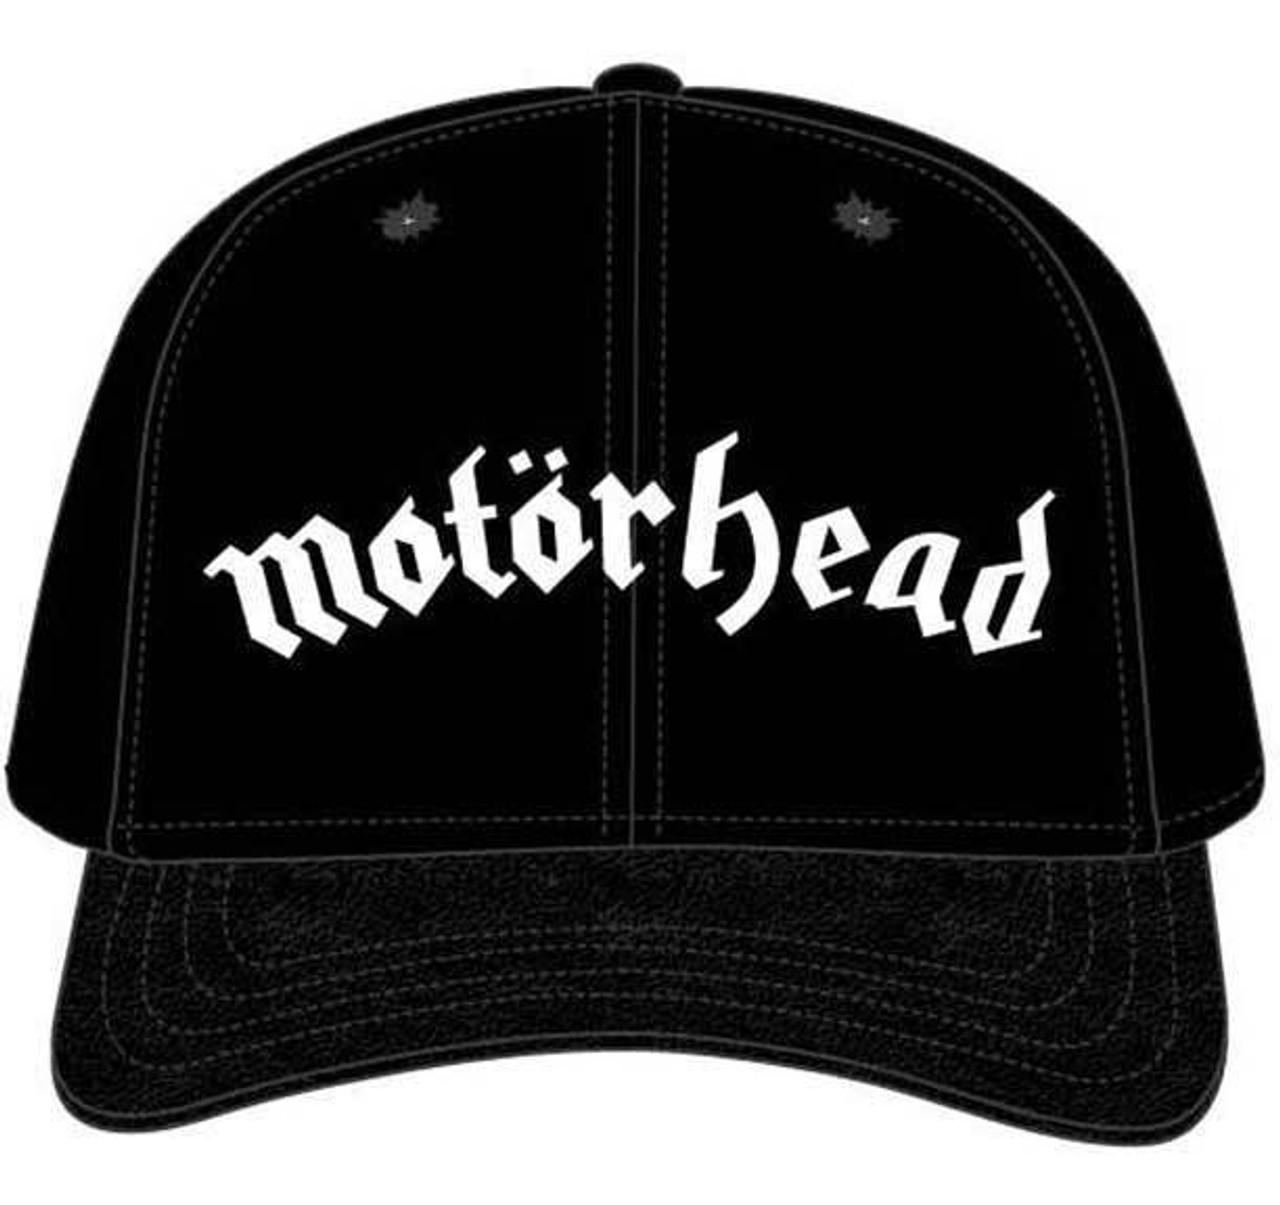 H3 Sportgear Motorhead Embroidered Adjustable Snapback Baseball Hat  SMHJ-100007 - Fearless Apparel 04ca4a6d265